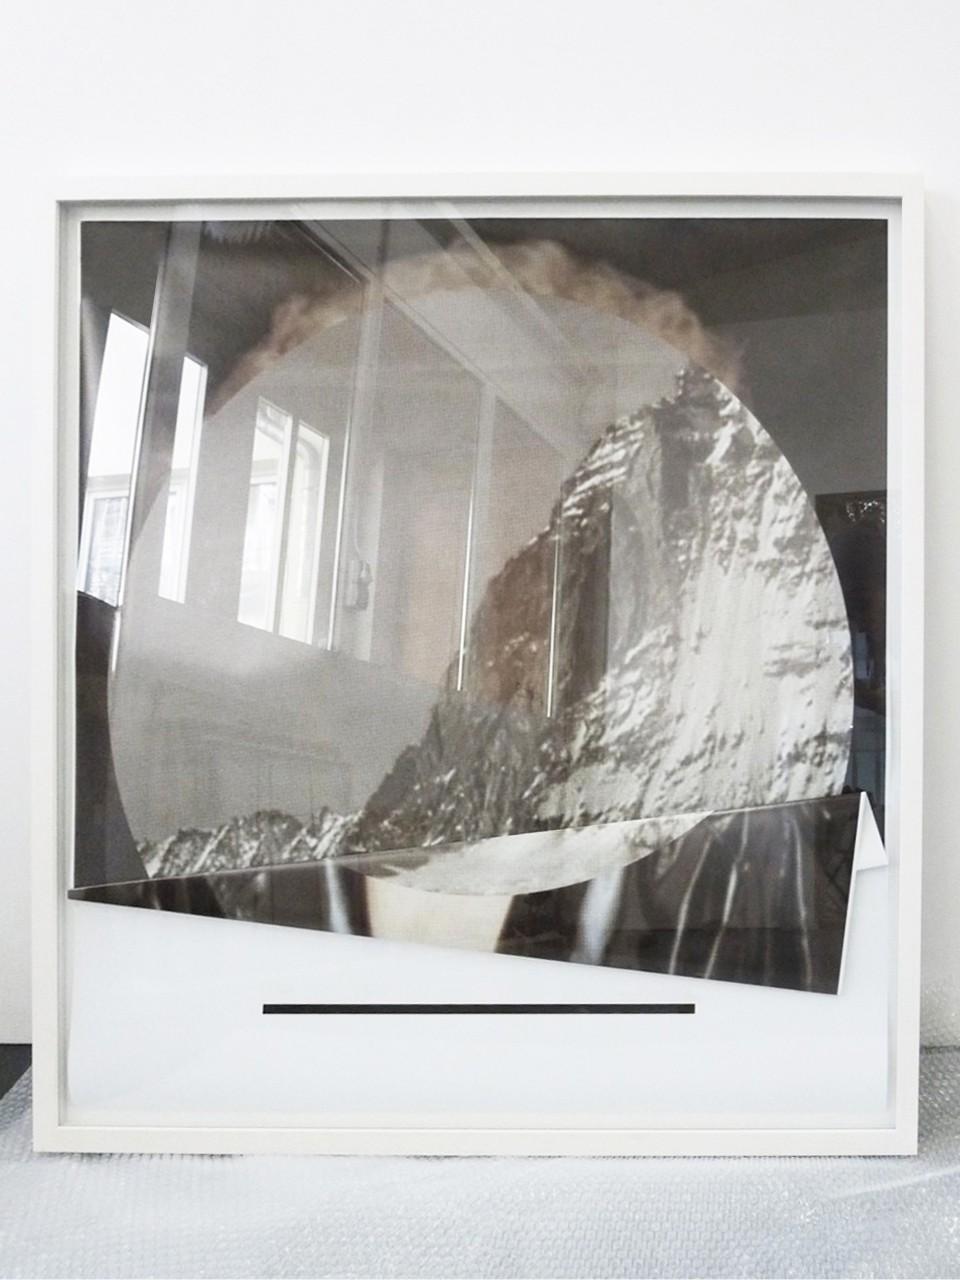 Untitled, 2013, Inkjet Print (gefaltet), 100 x 100 cm